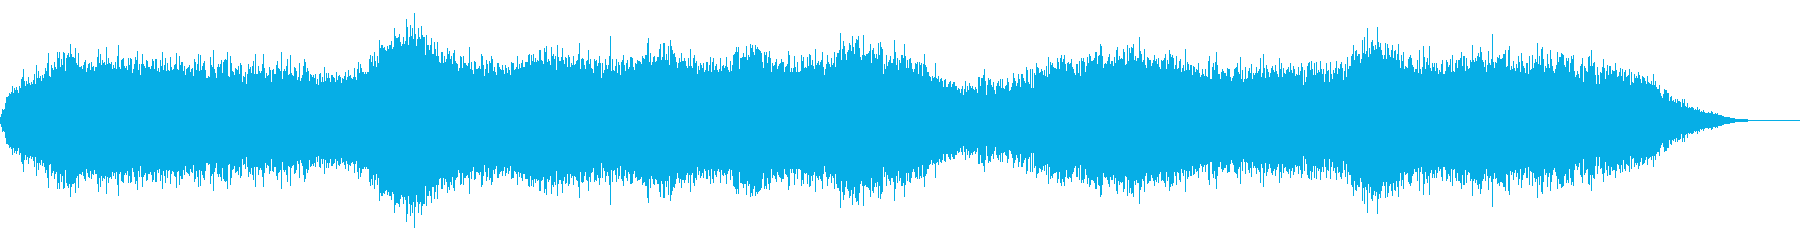 drone21の再生済みの波形